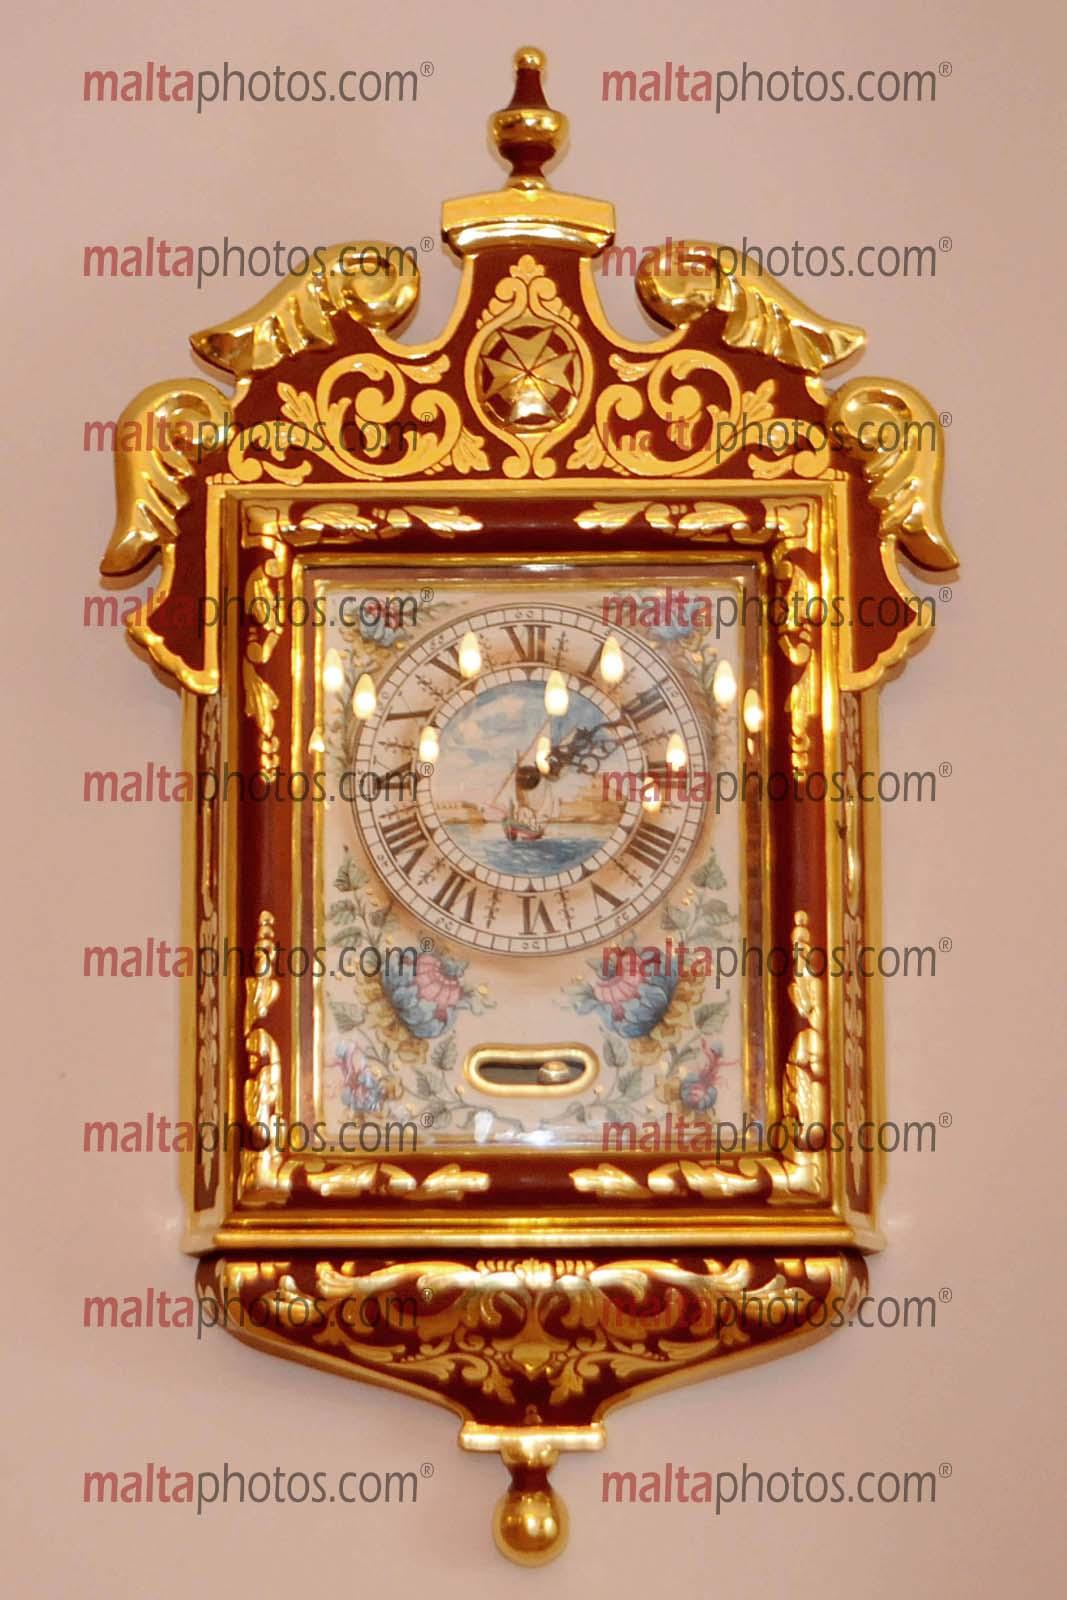 Gilder Mdina Gold Foil Crafts Arlogg Tal Lira Maltese